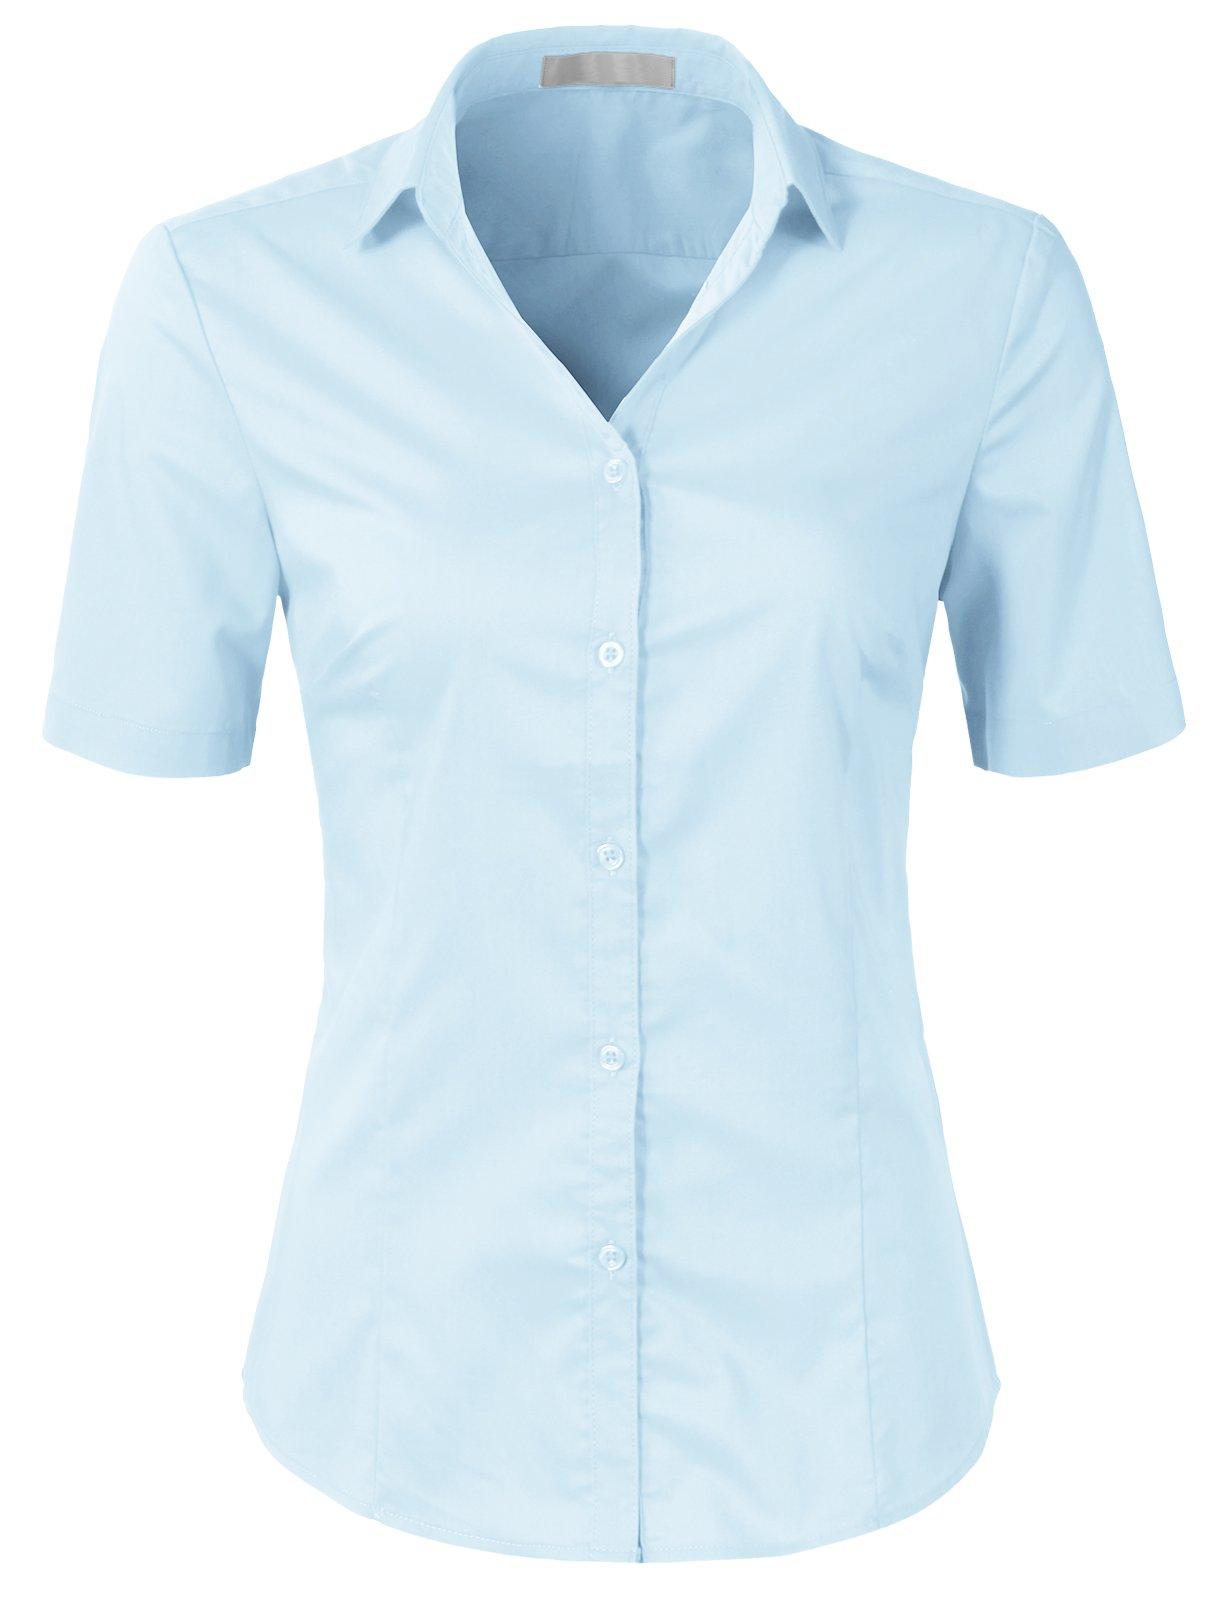 Galleon - H2H Womens Slim Fit Formal Short Sleeve Button Down Dress Shirt  Blouse Top SkyBlue XL 483ed3864